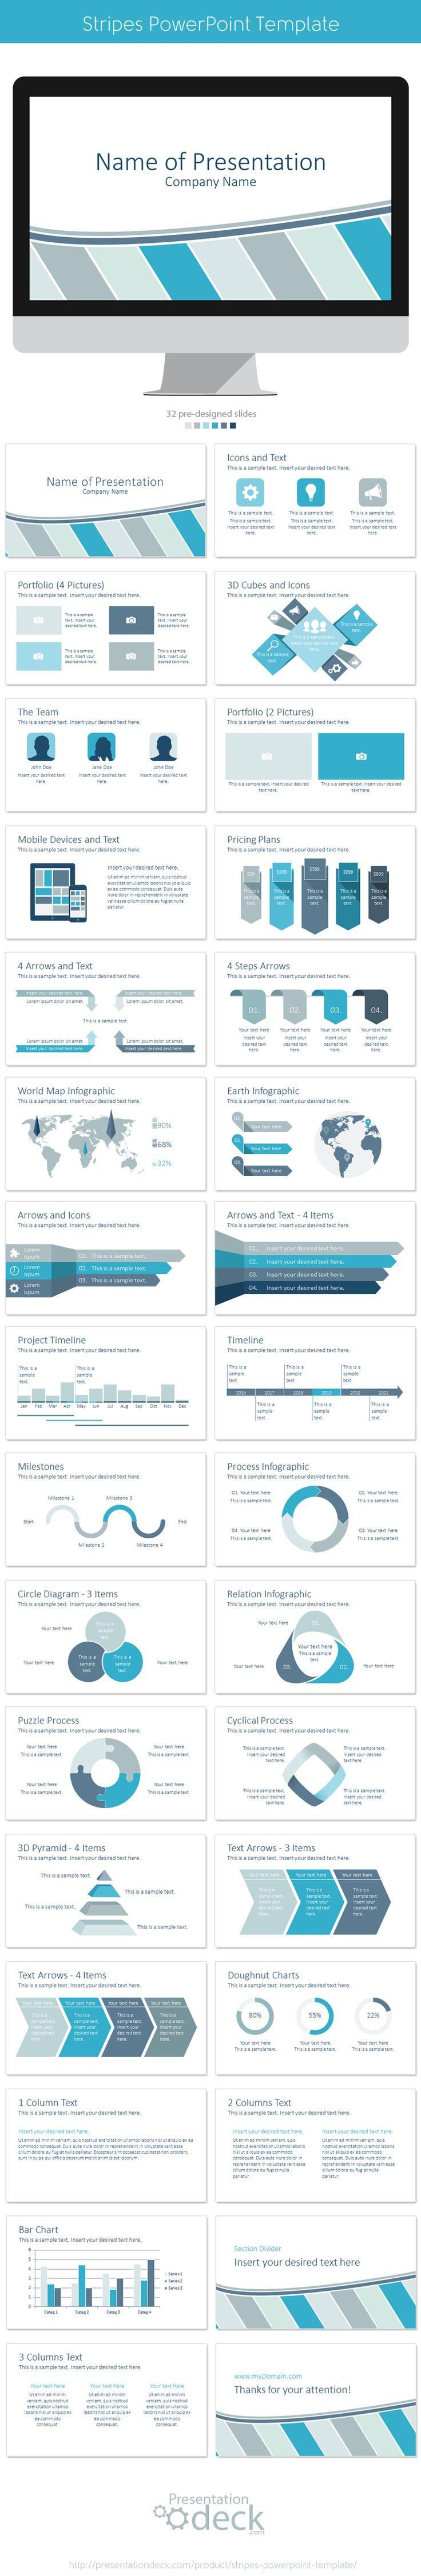 Stripes PowerPoint Template, 32 pre-designed slides. #powerpoint #presentation